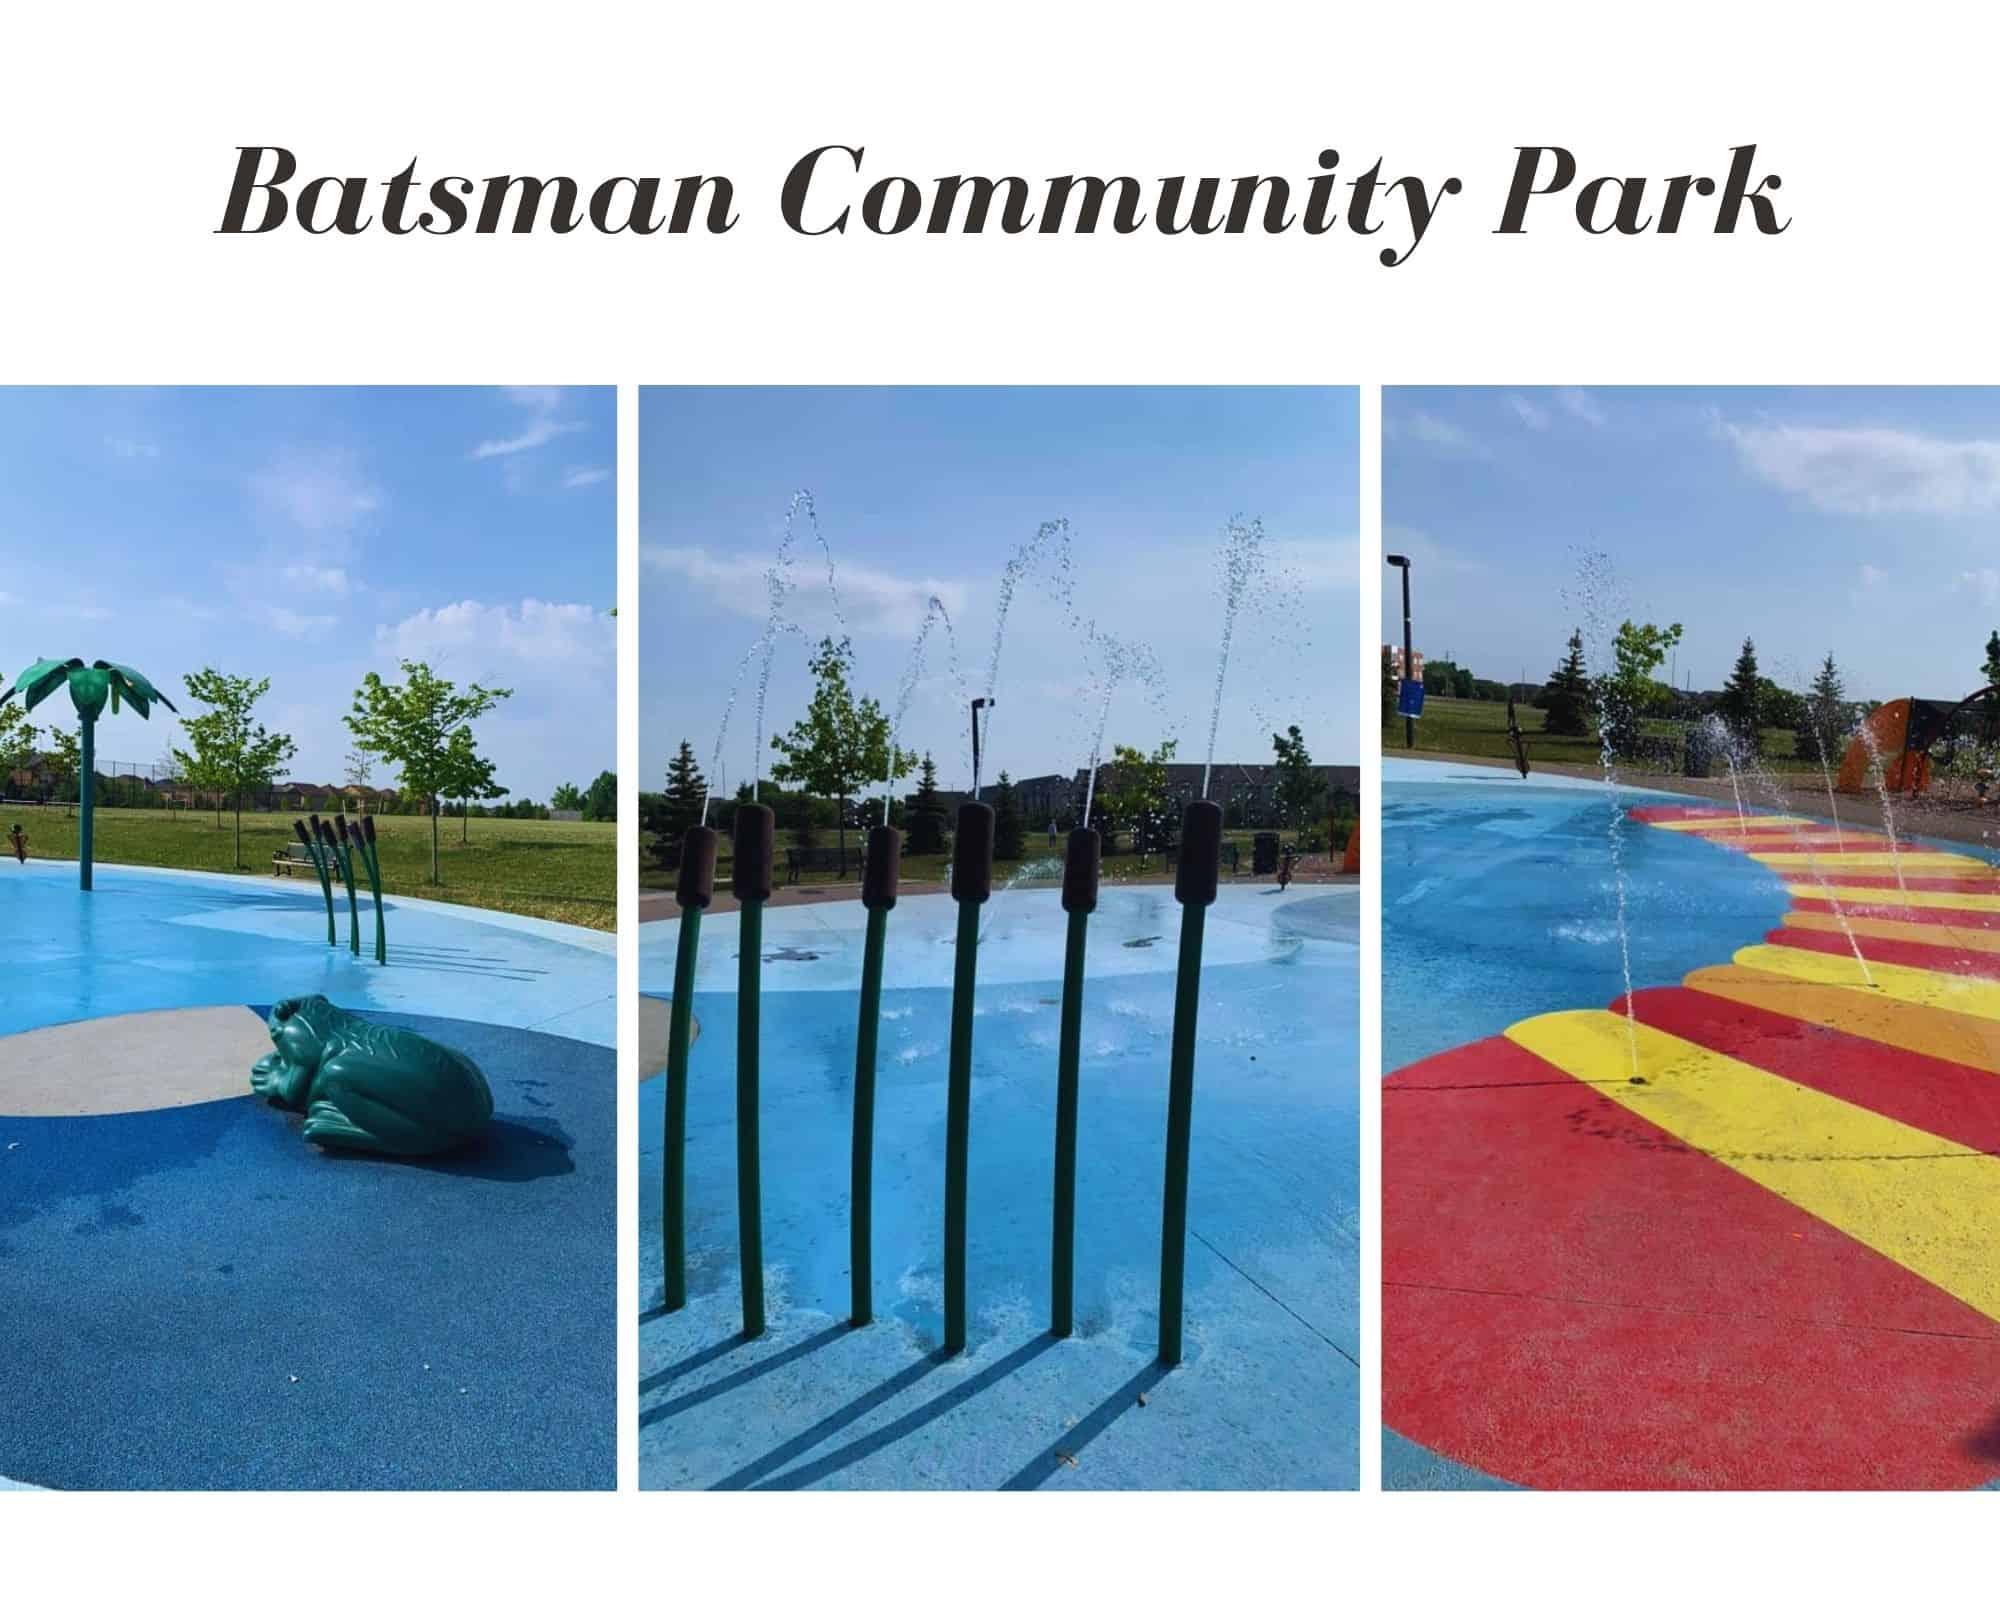 Batsman Community Park